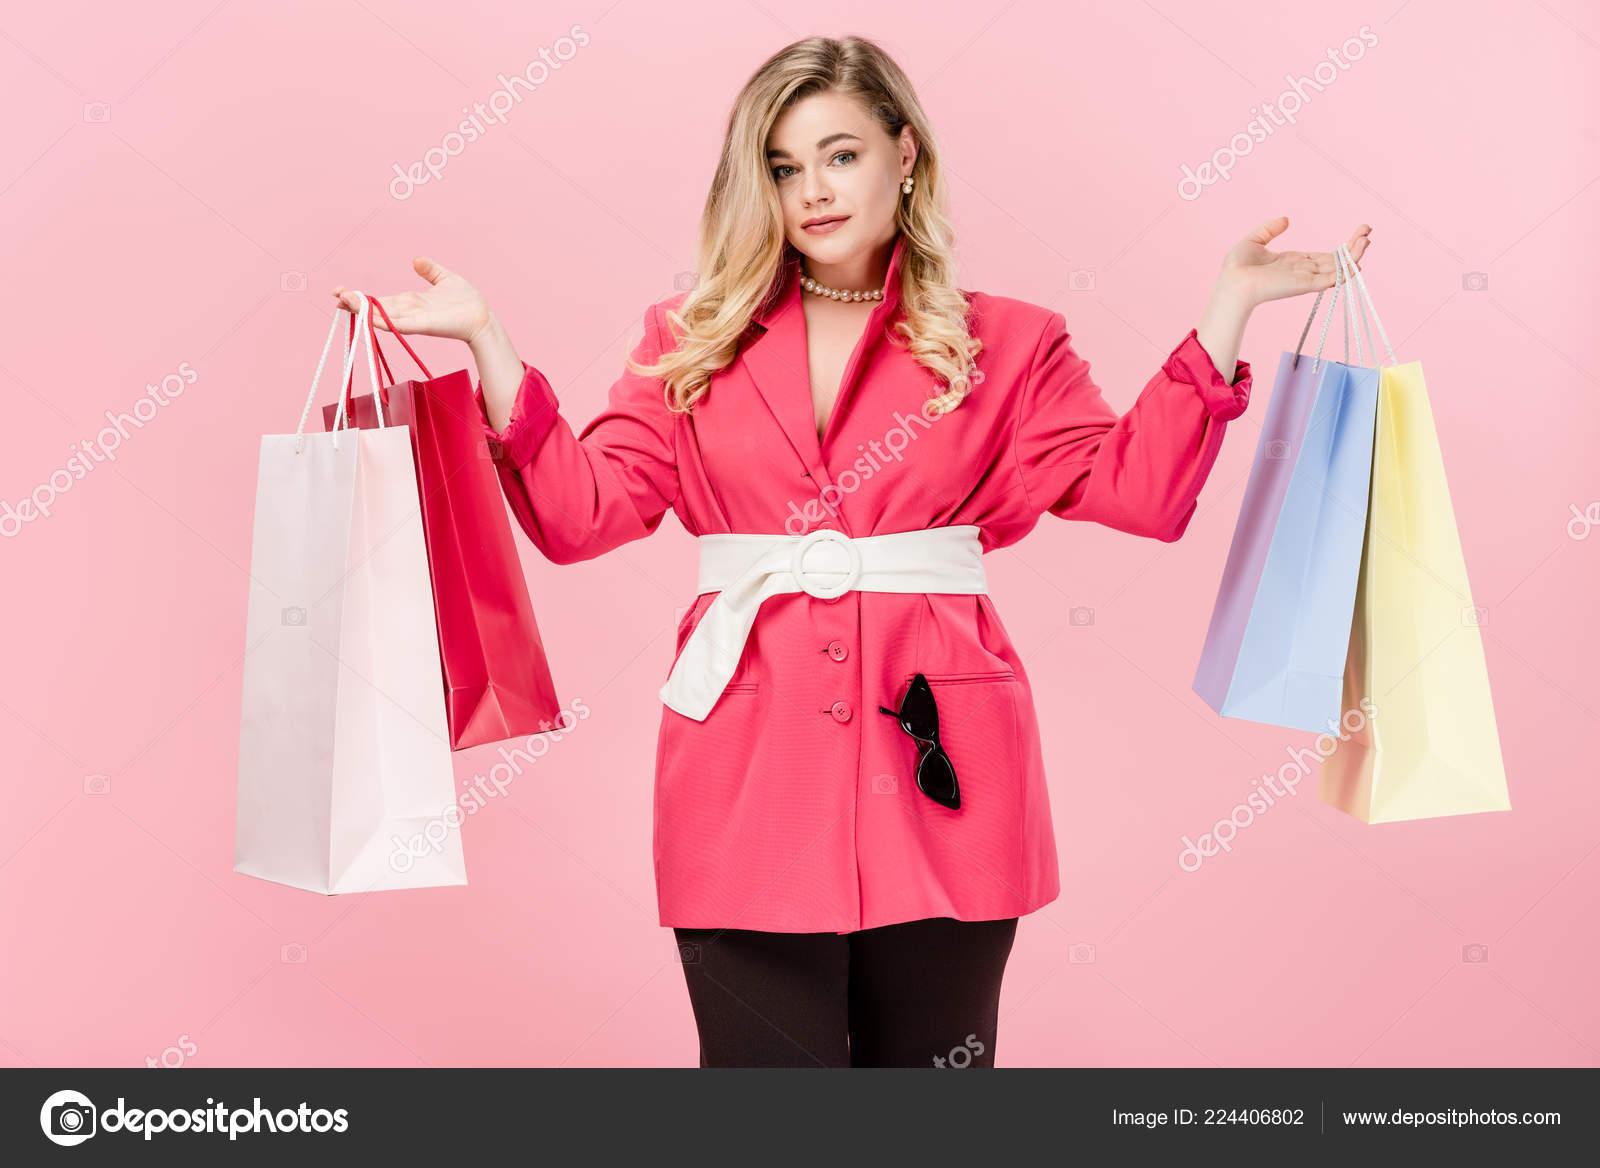 216e48c549 Όμορφη Μόδας Νεαρή Υπέρβαρη Γυναίκα Κρατώντας Τσάντες Για Ψώνια Και — Φωτογραφία  Αρχείου